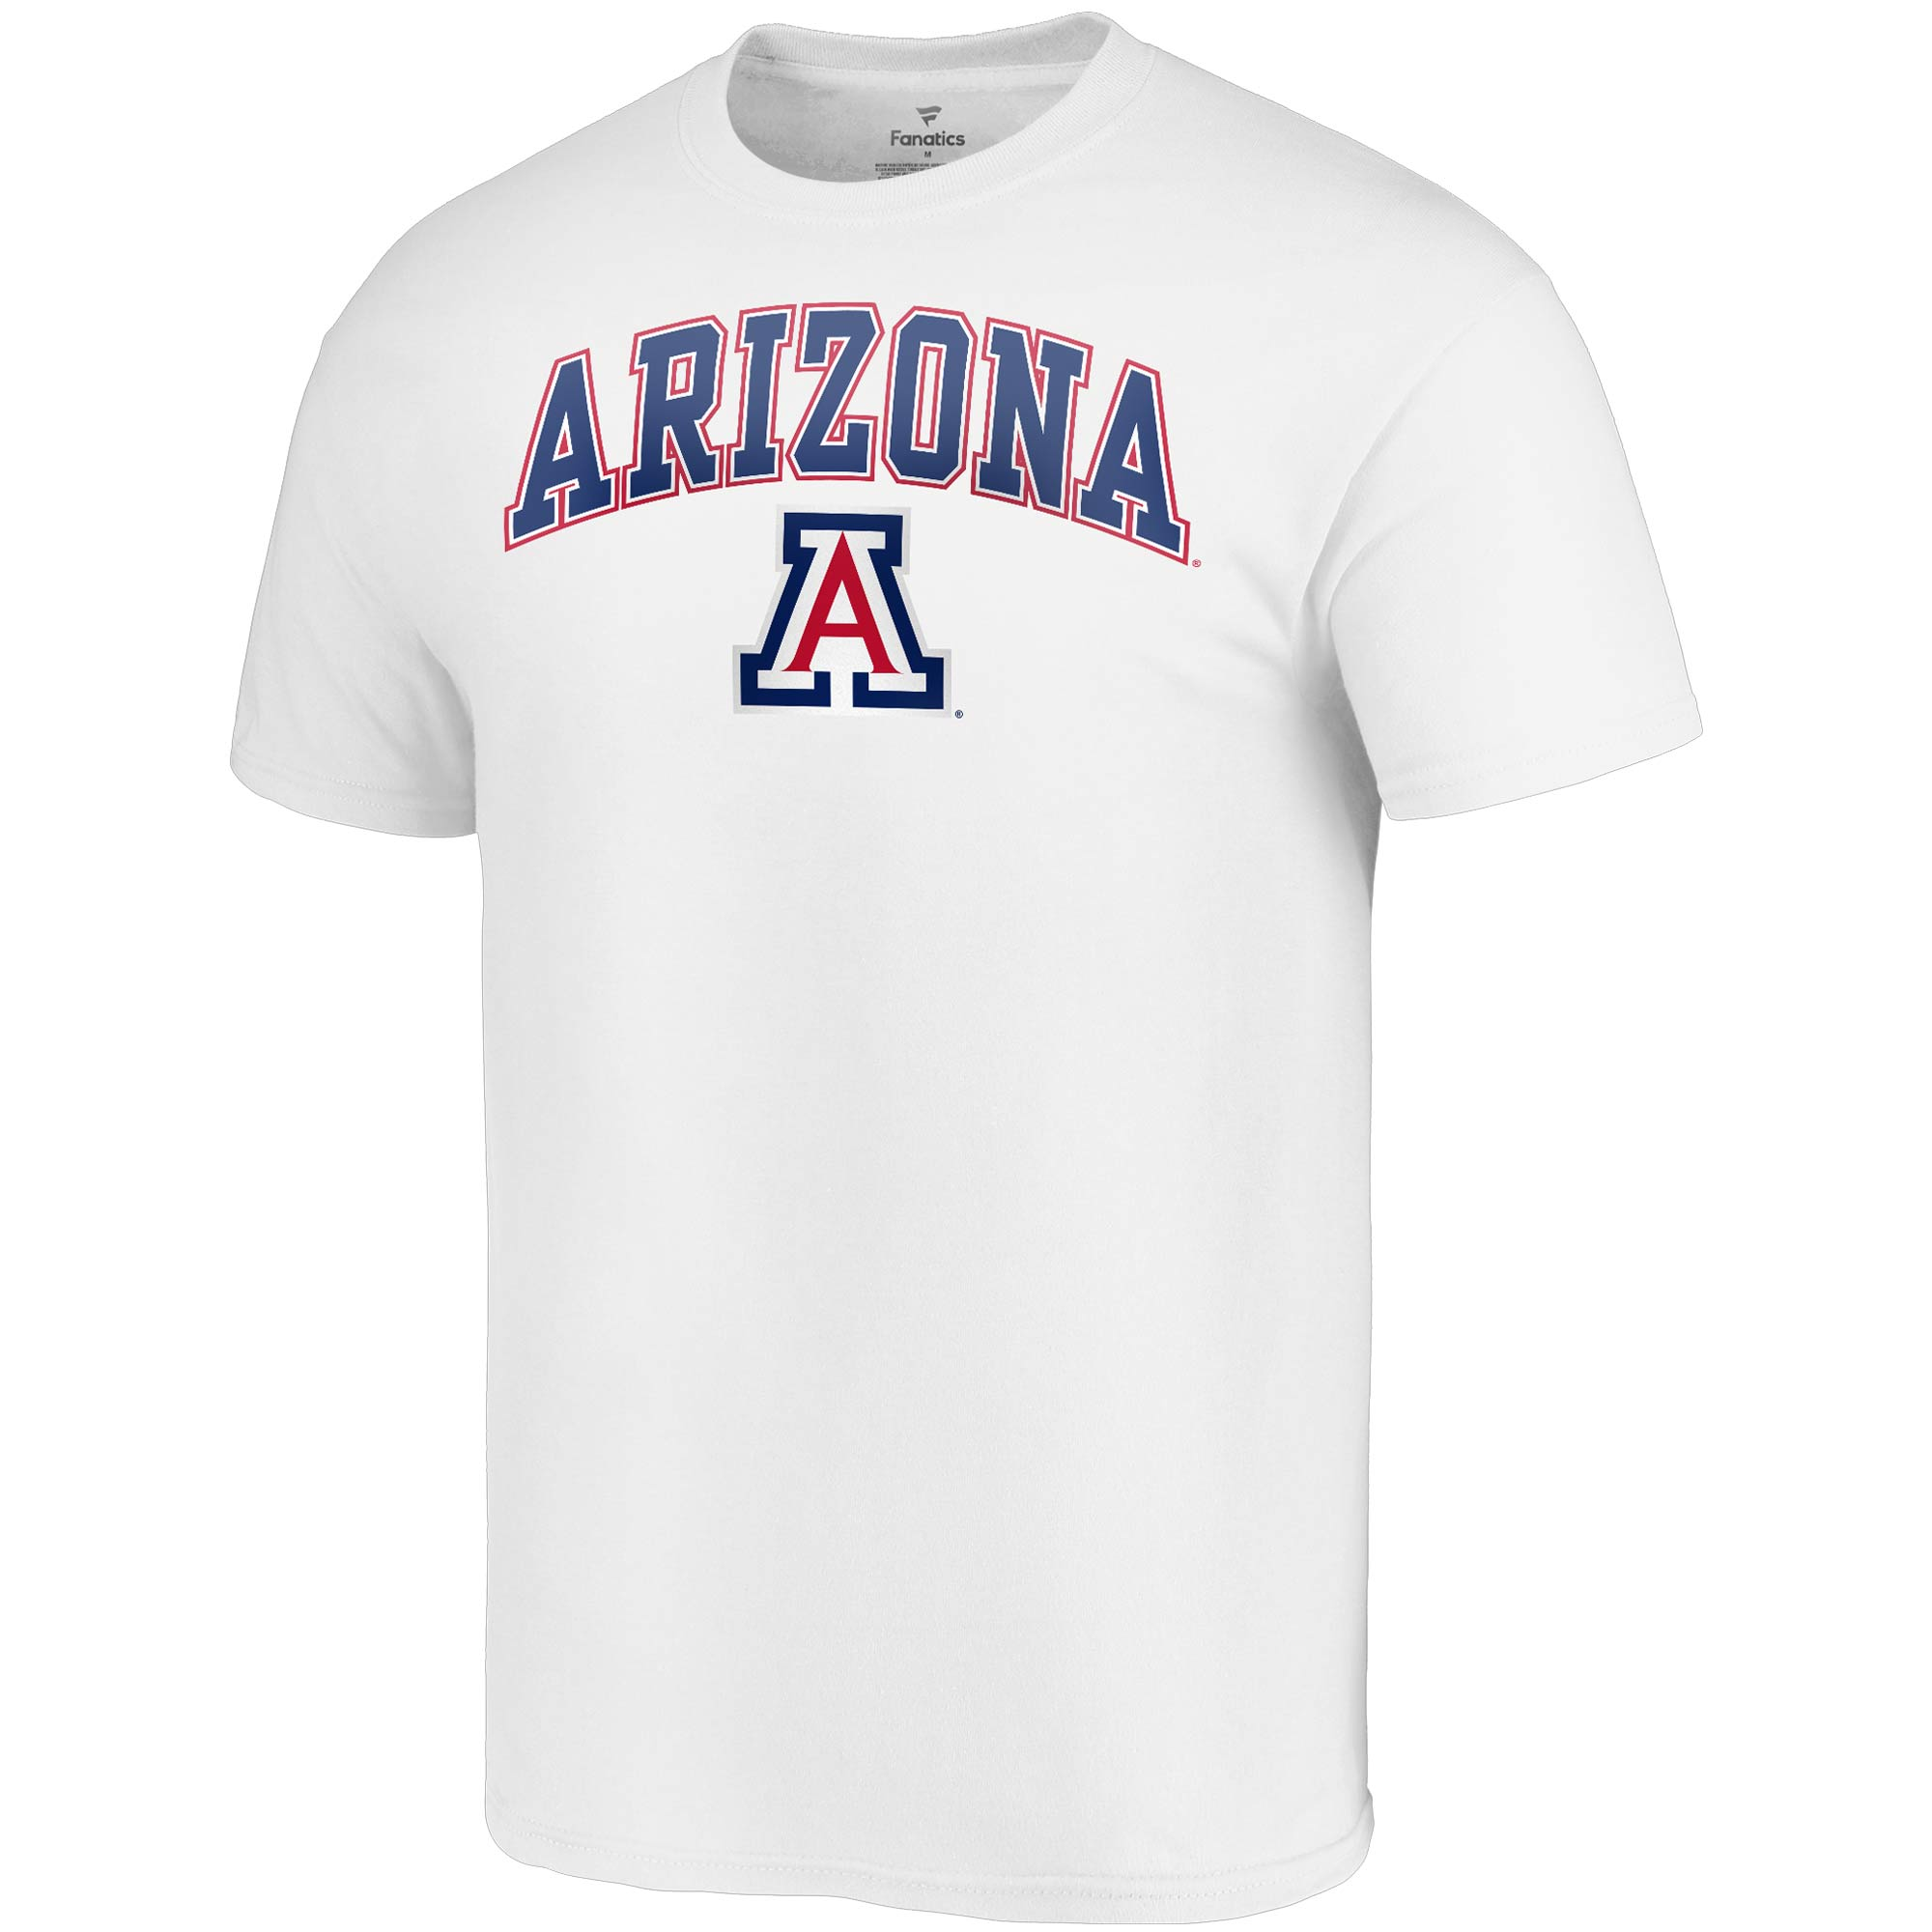 6891fc11afe Arizona Wildcats Fanatics Branded Campus T-Shirt - White - Walmart.com